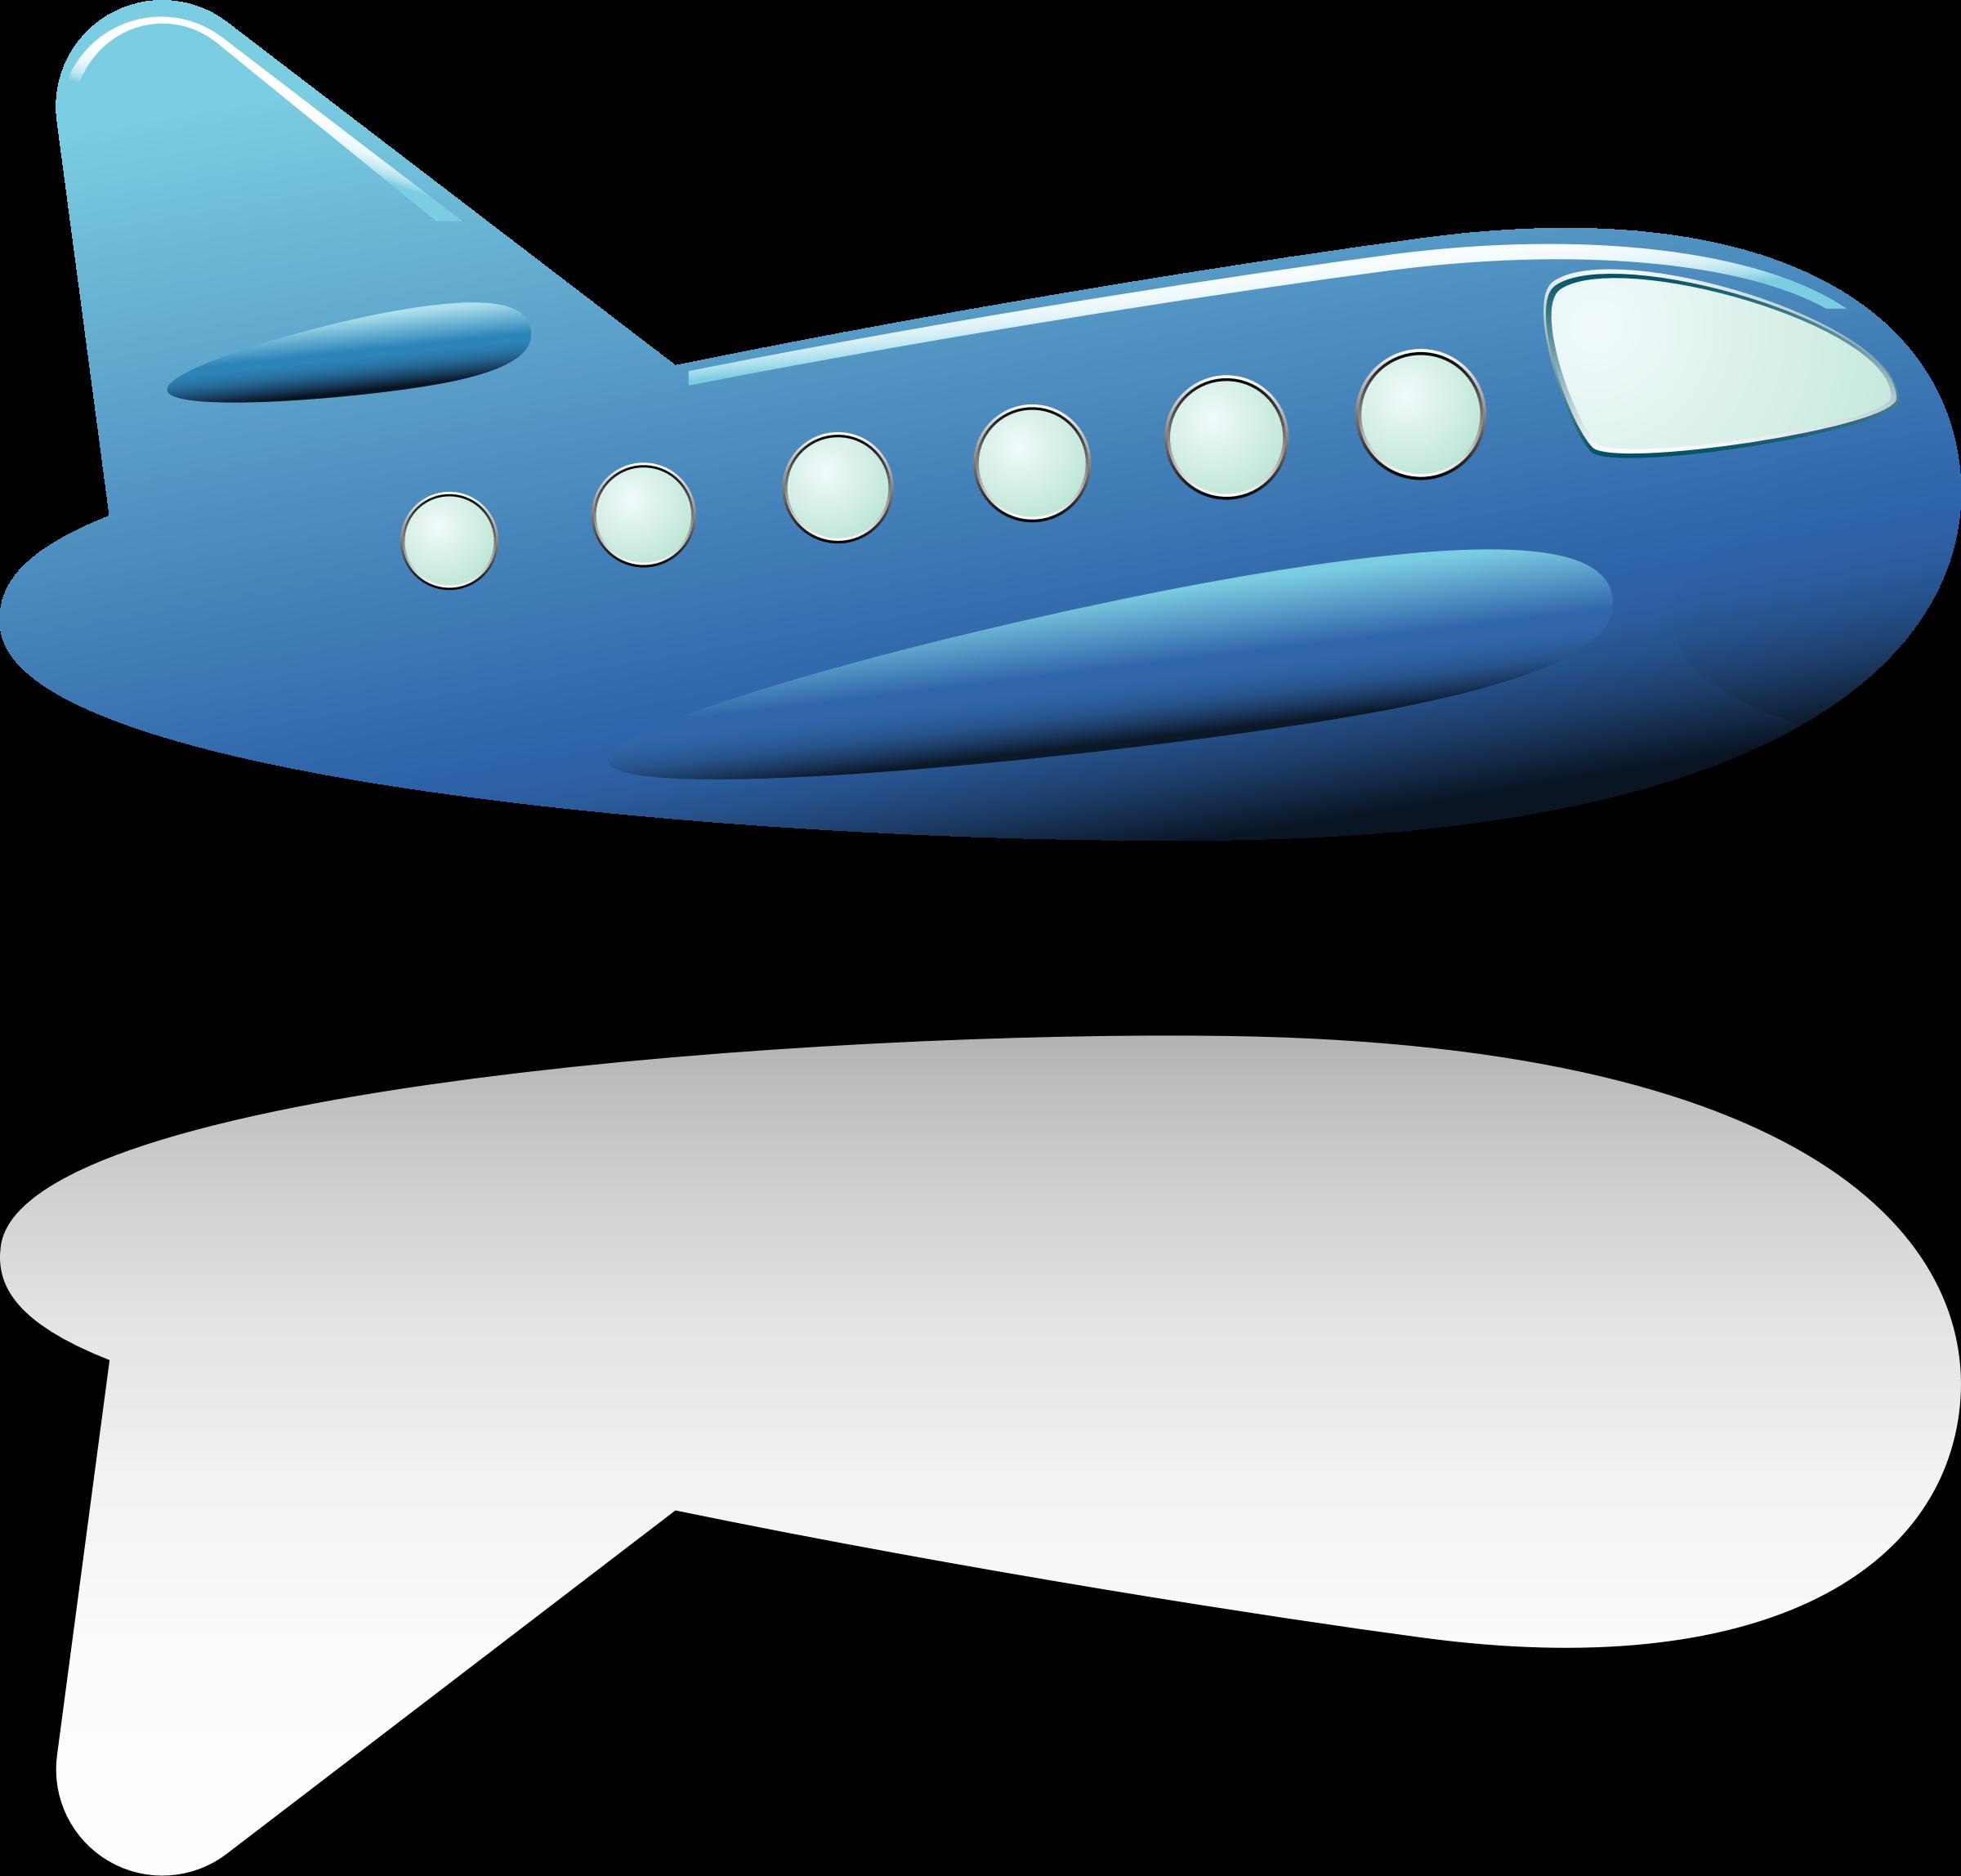 Clipart airplane shadow. Aircraft big image png